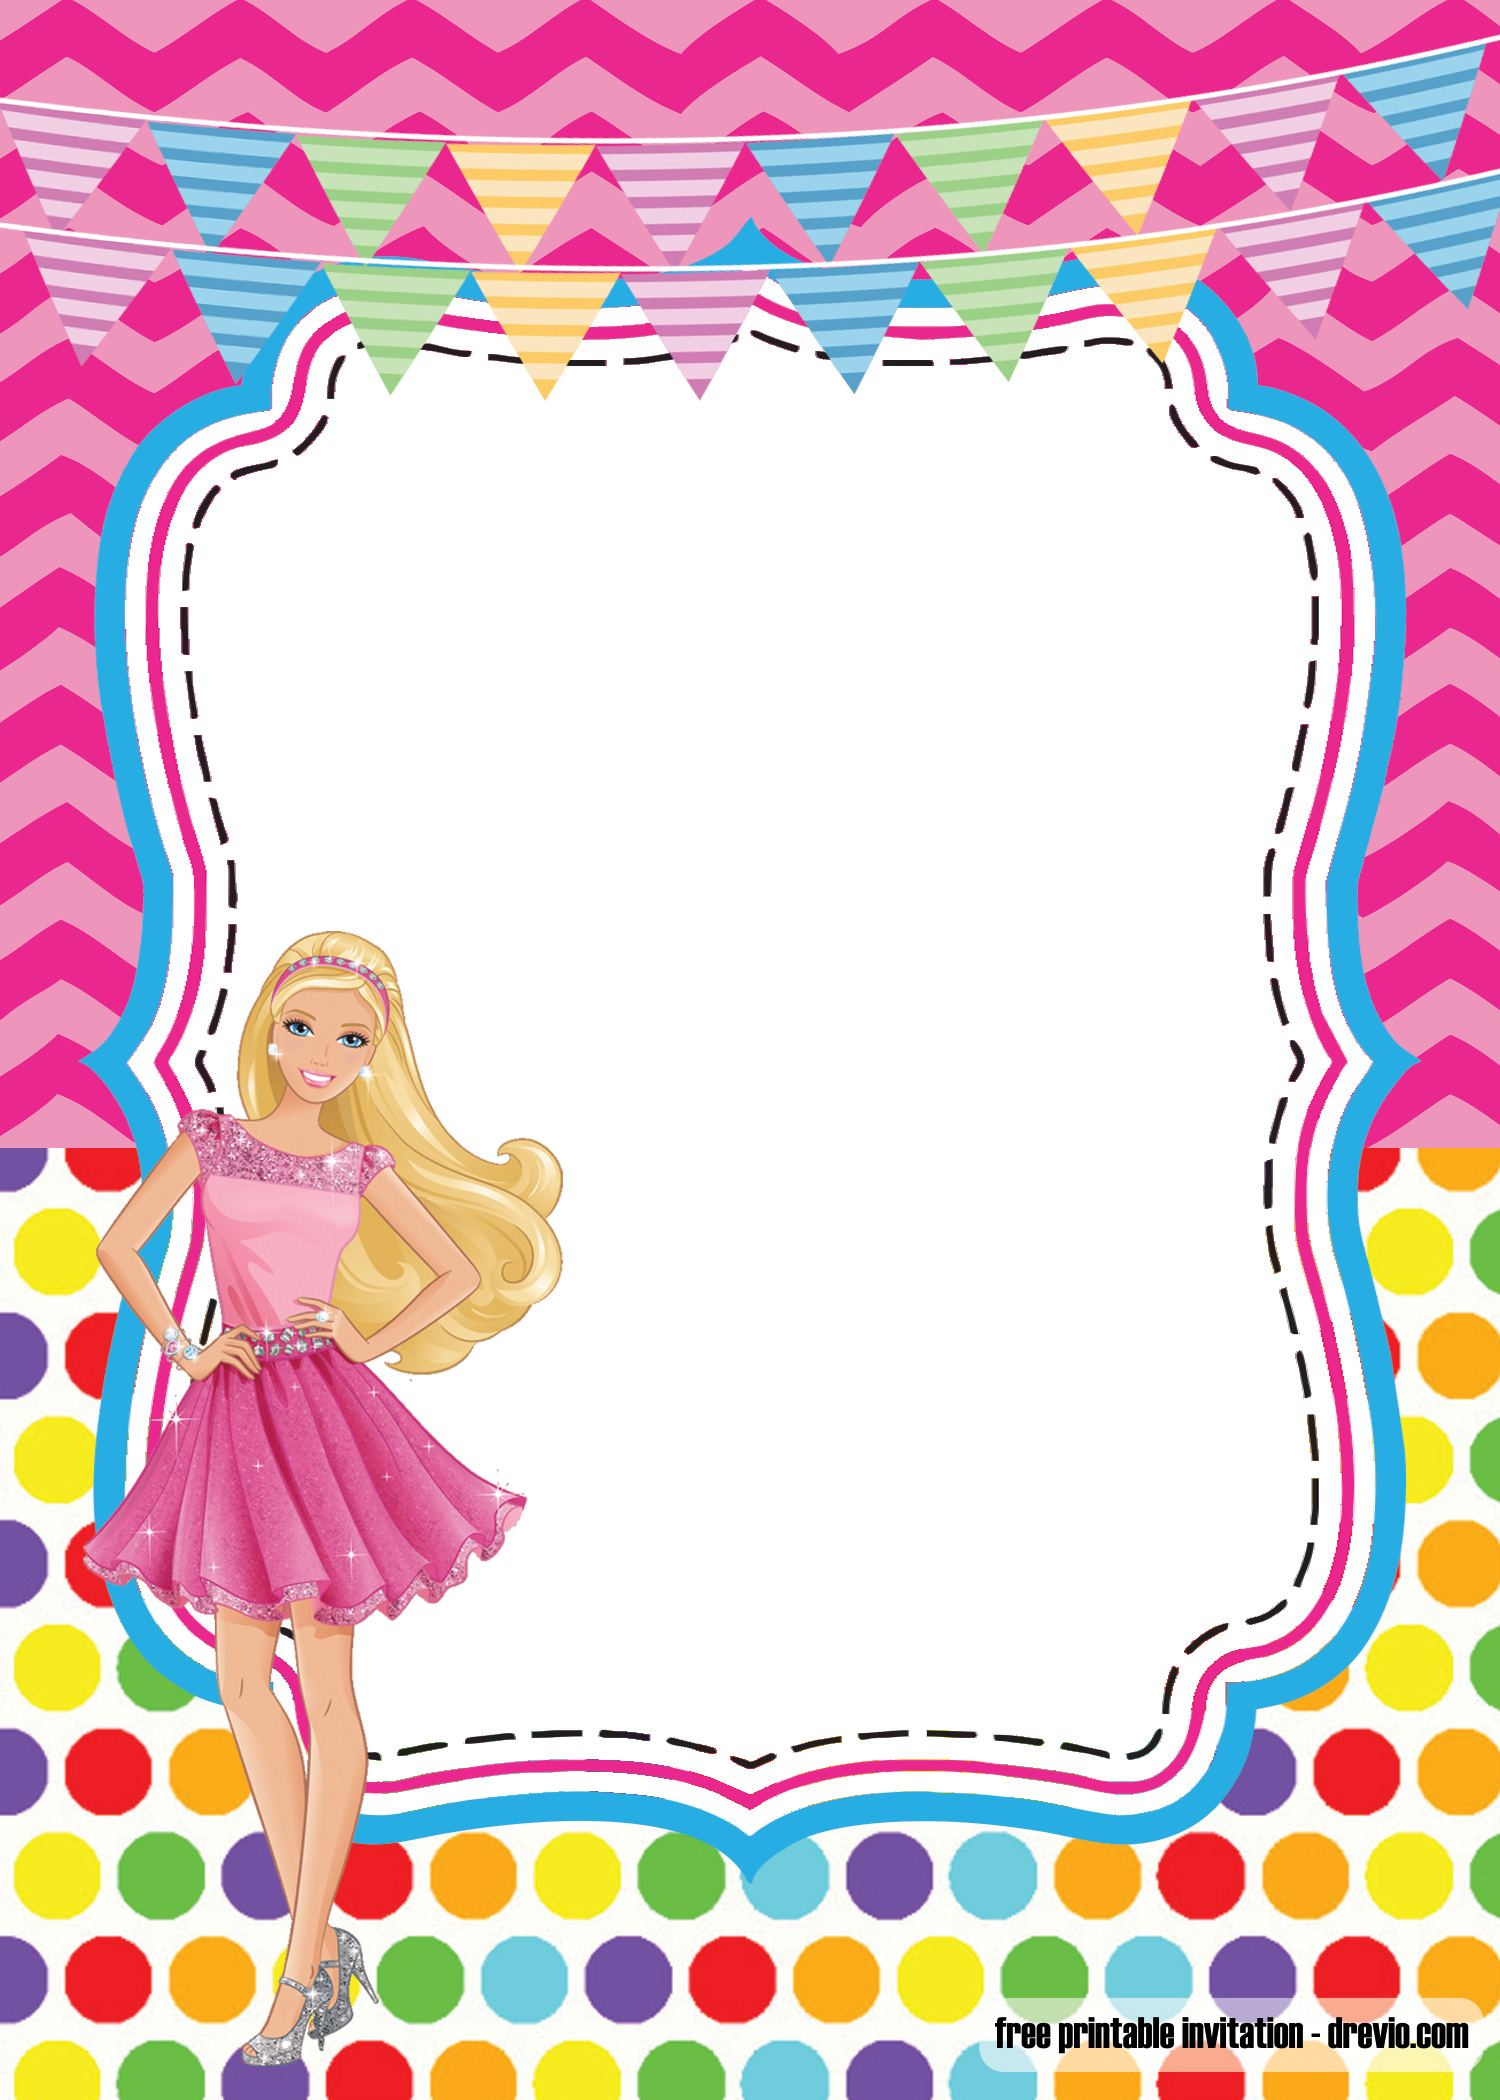 Girlie Birthday With Barbie Invitation Template FREE Printable FREE Invitation Templates